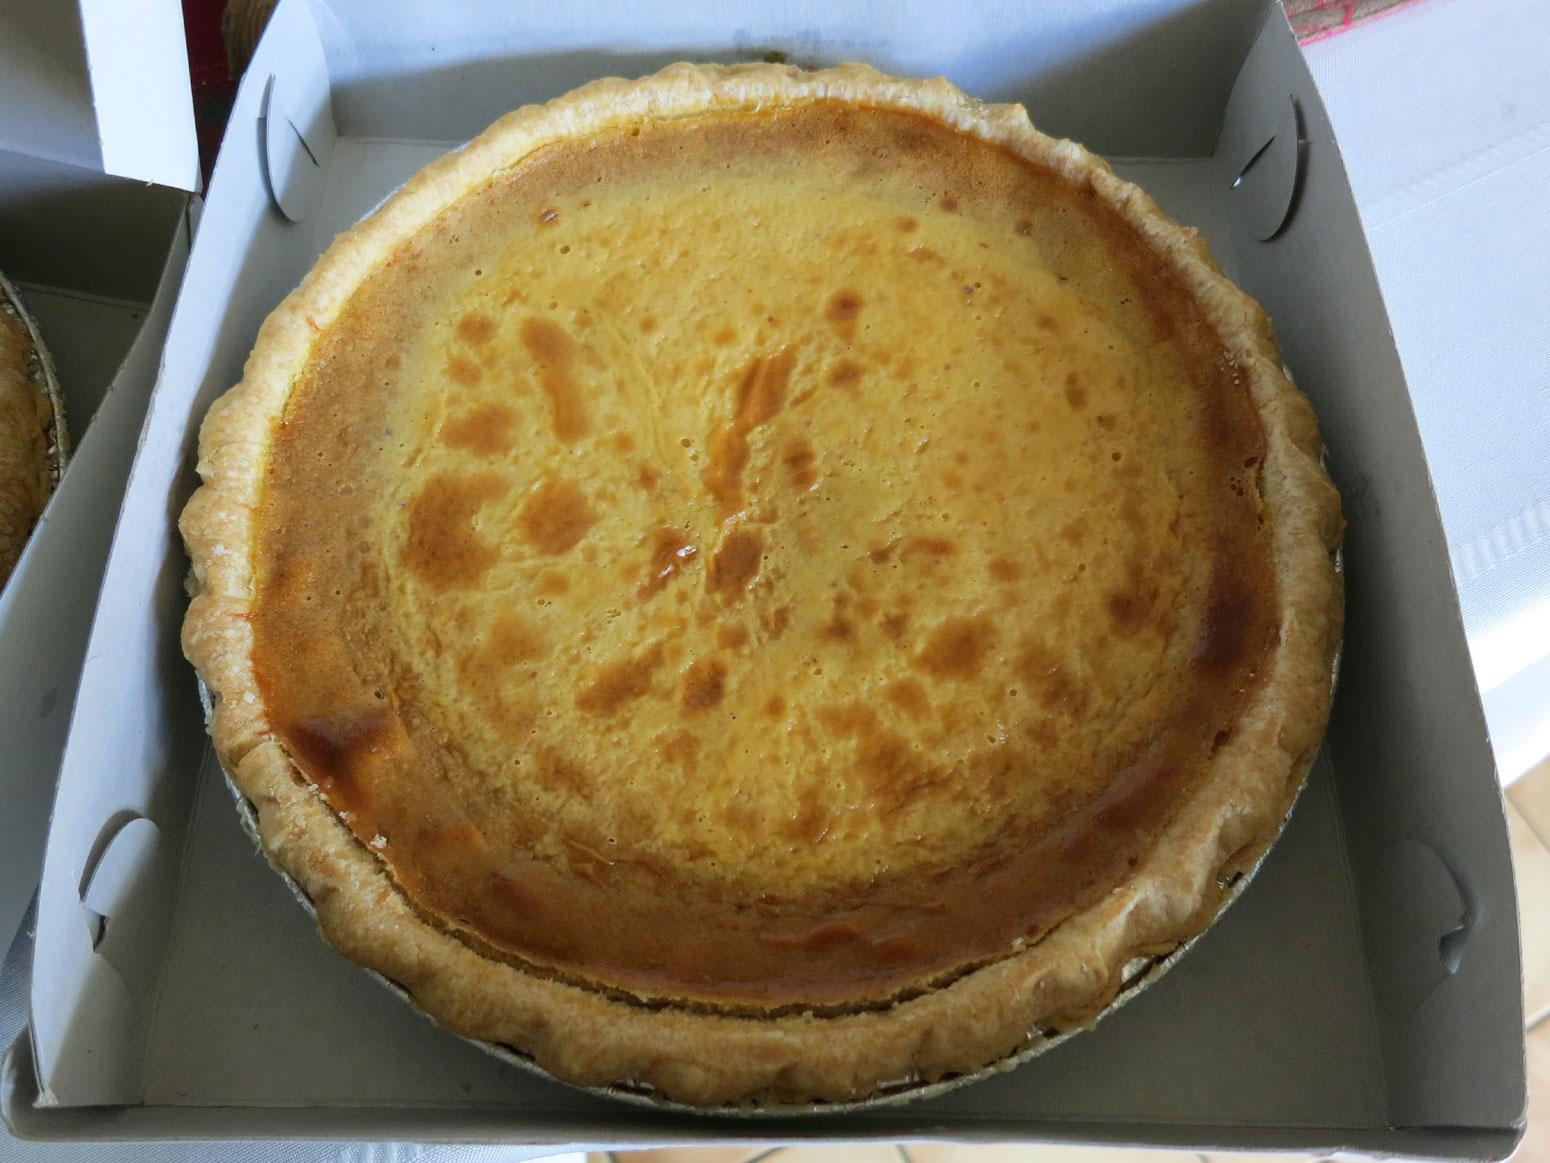 Lee's Bakery (King Street, Chinatown Honolulu) Pumpkin-Custard Pie